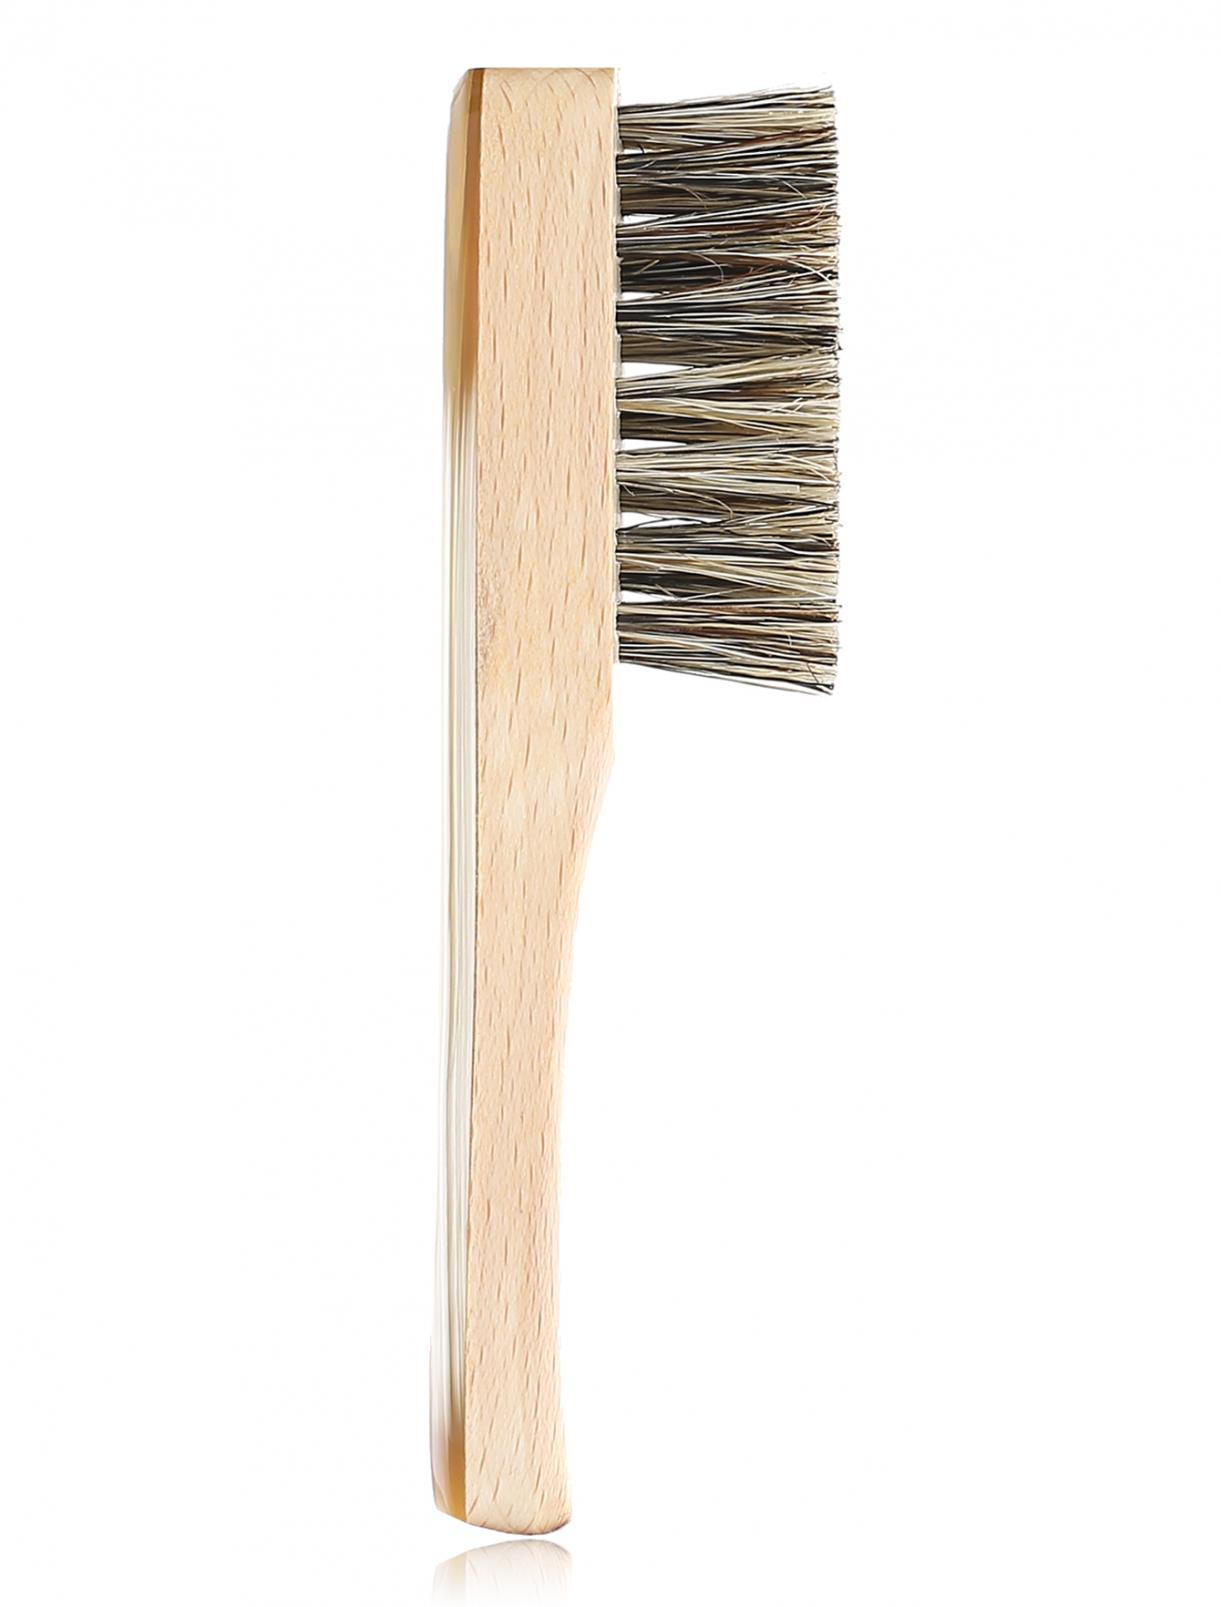 Щетка для бороды из натуральной щетины - Truefitt & Hill Truefitt & Hill  –  Общий вид